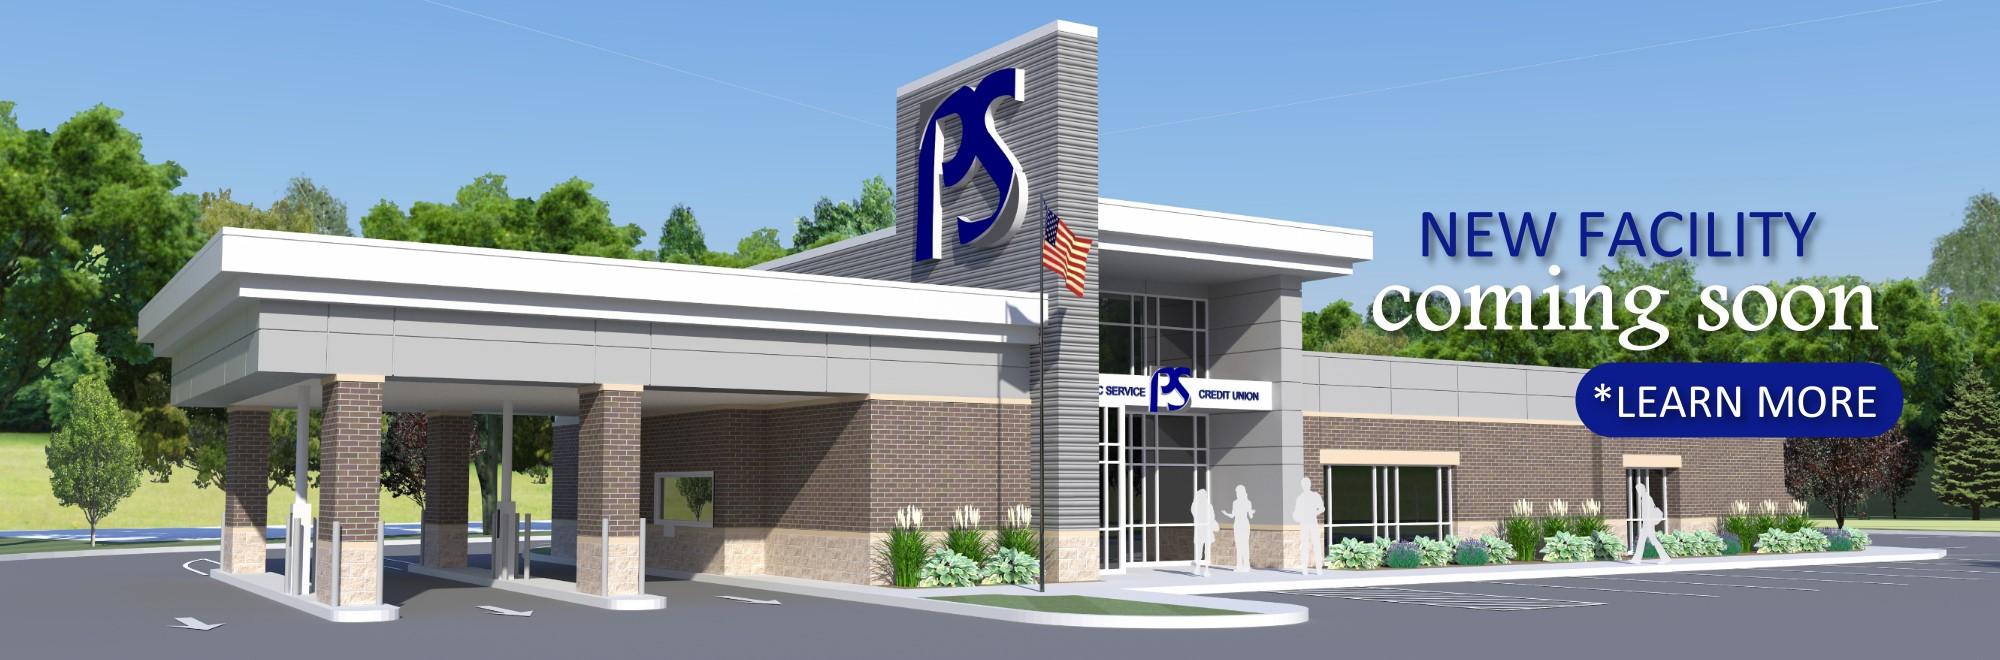 new facility image